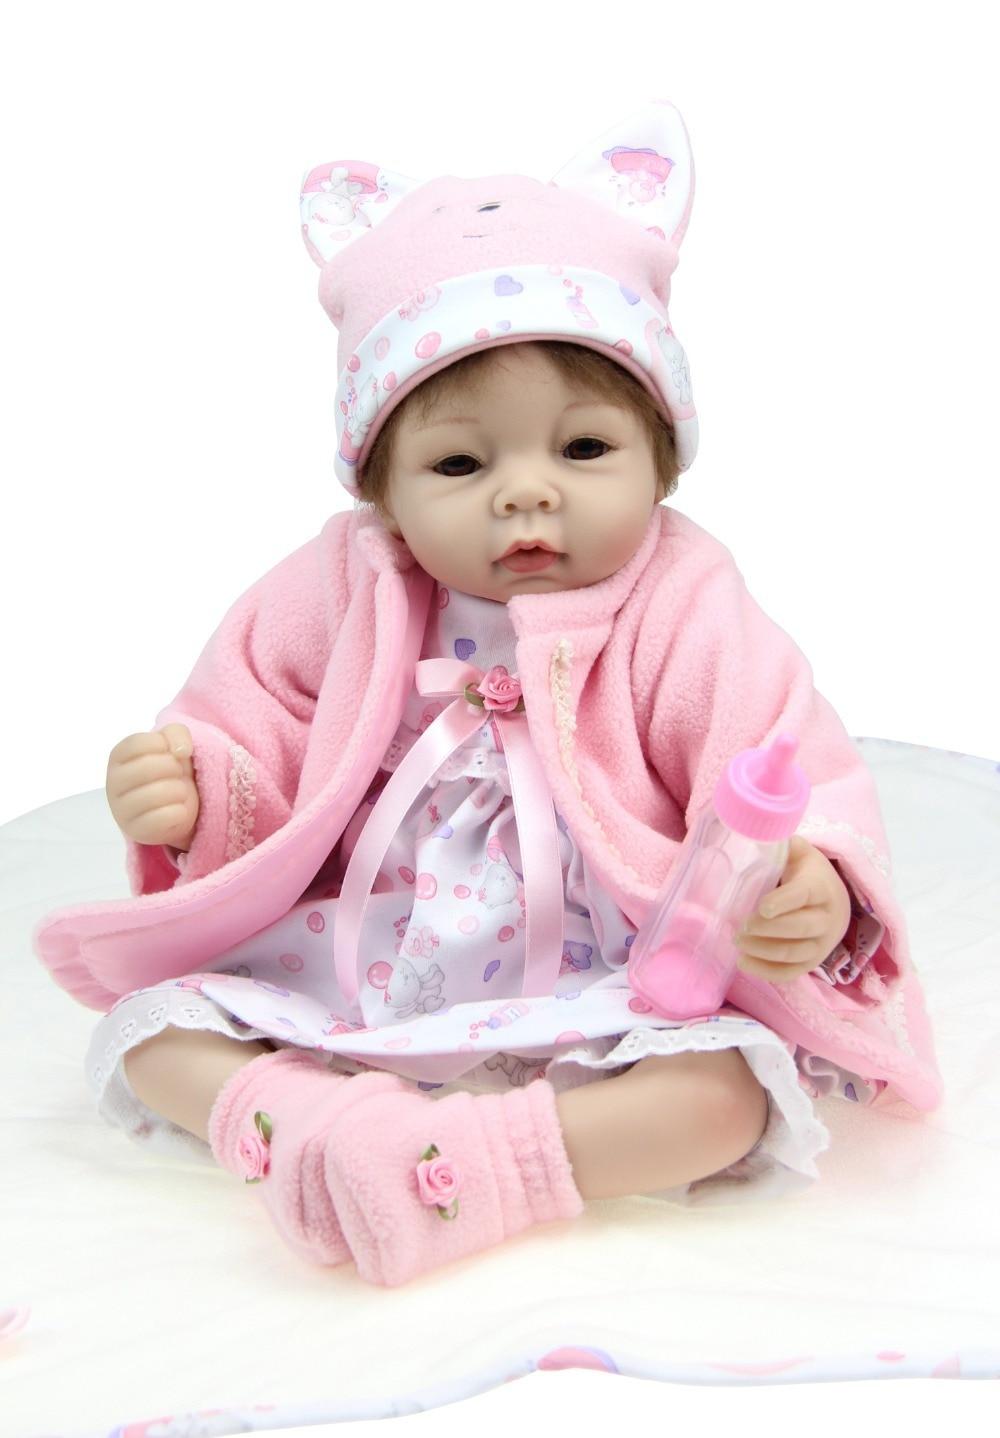 ФОТО fashion 22 inch silicone vinyl baby dolls reborn handmade kids hobbies princess dolls toys for children birthday gift